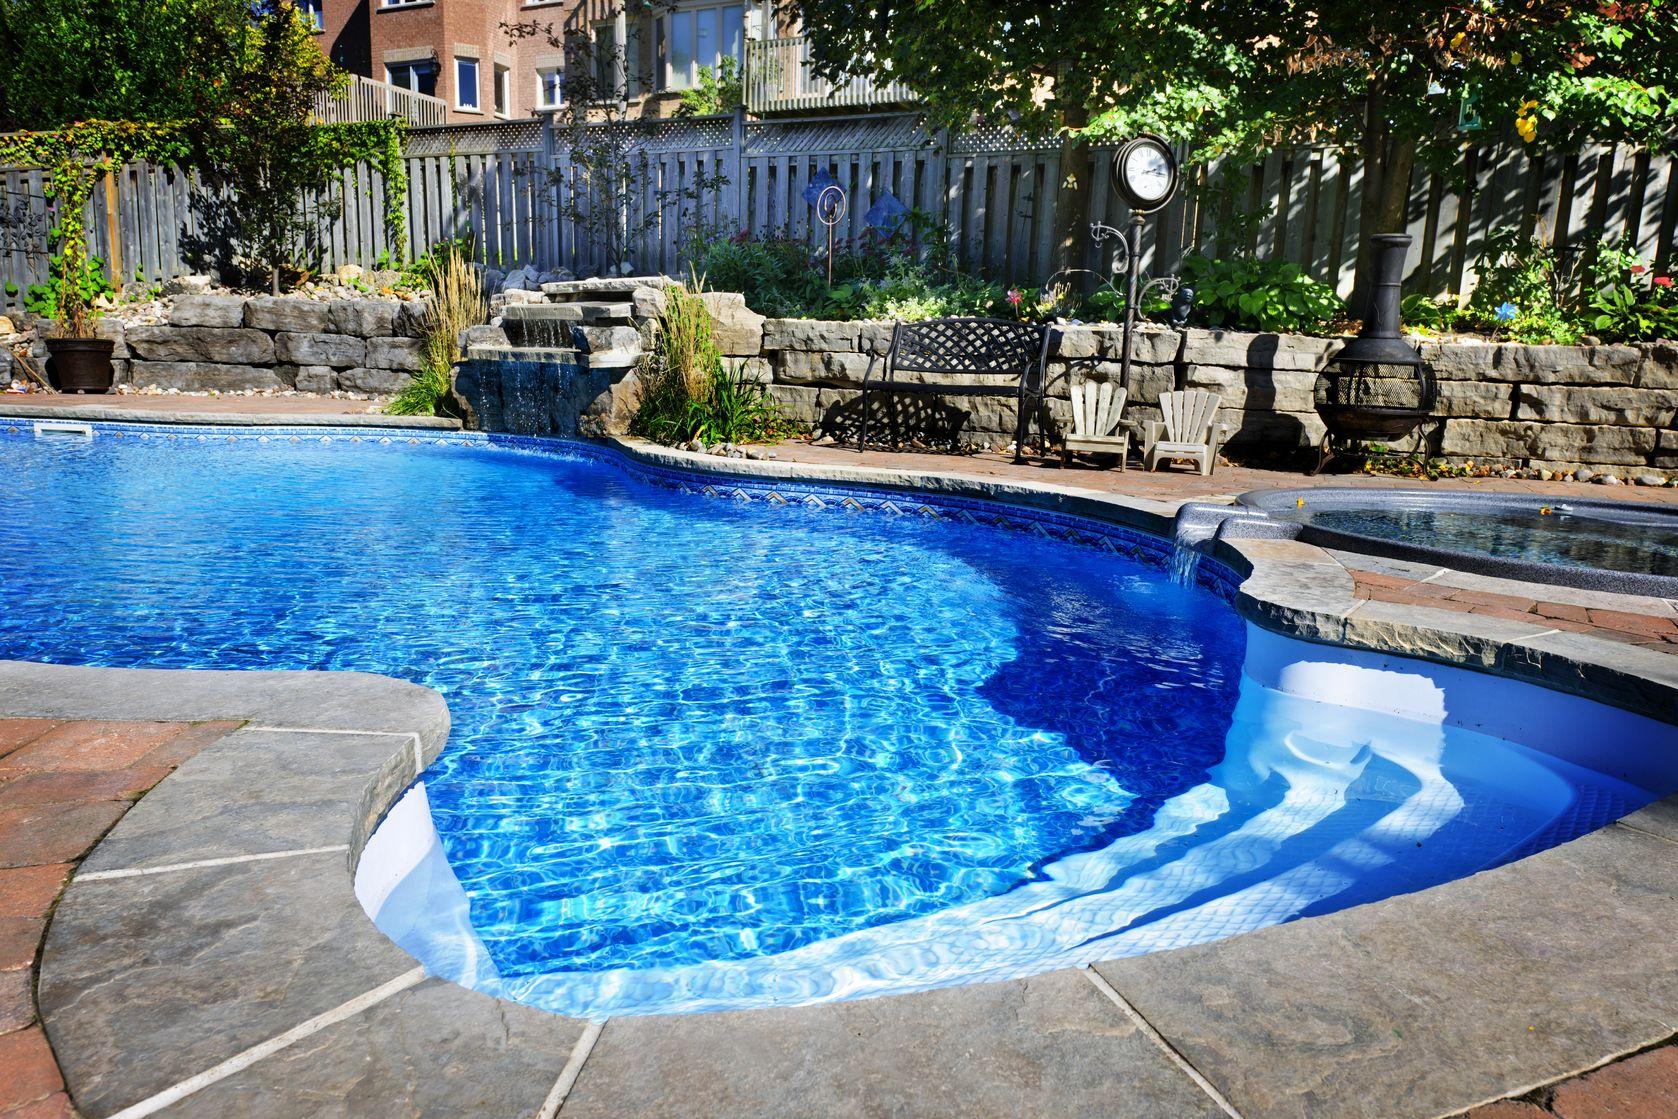 The Best Pool Builders in Woodlands, TX